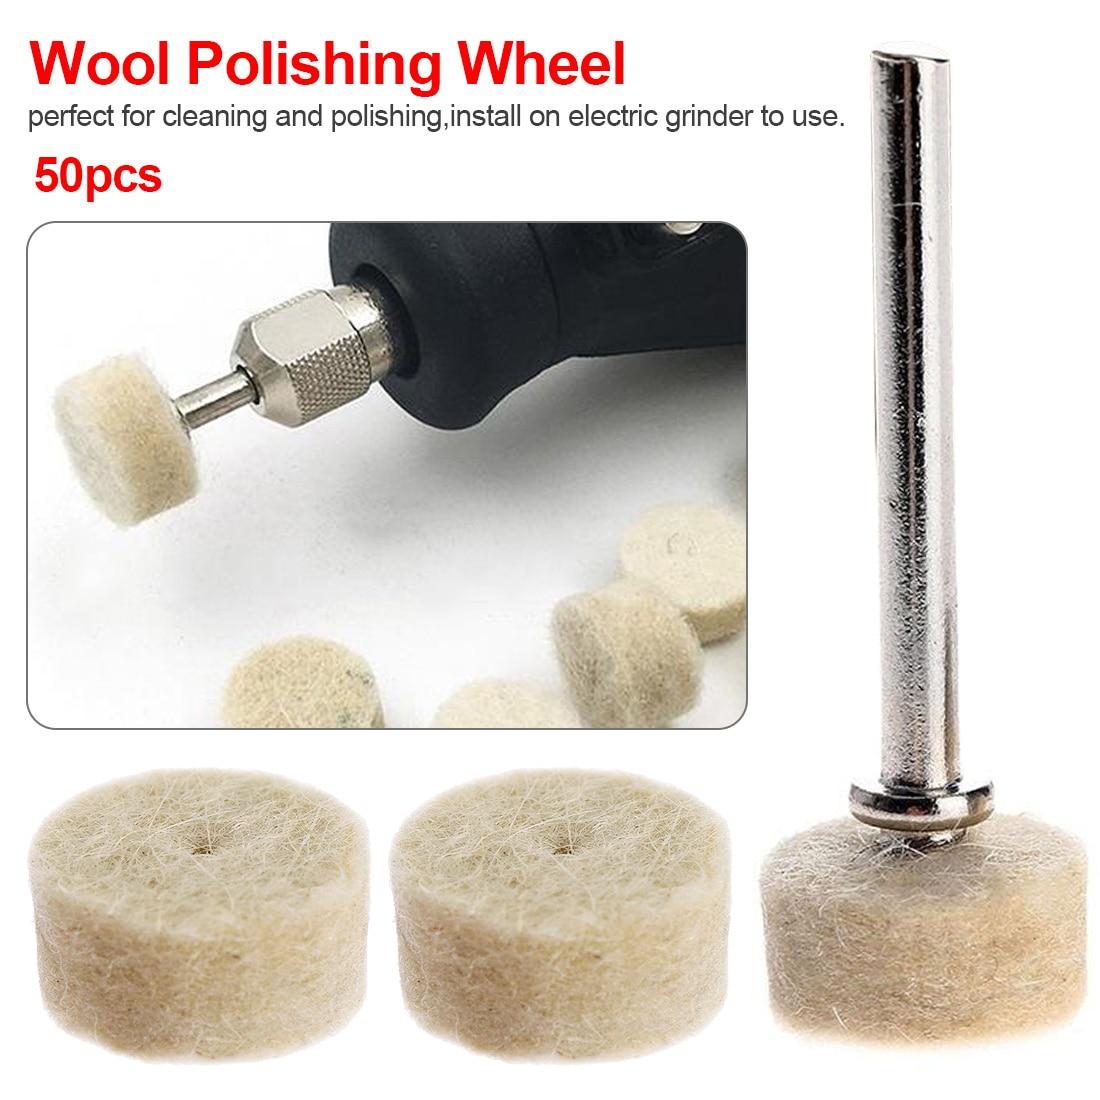 50pcs Buffing Wheel With 2Pcs 3.2mm Mandrel For Rotary Tool Grinding Polishing Pad Wool Felt Polishing